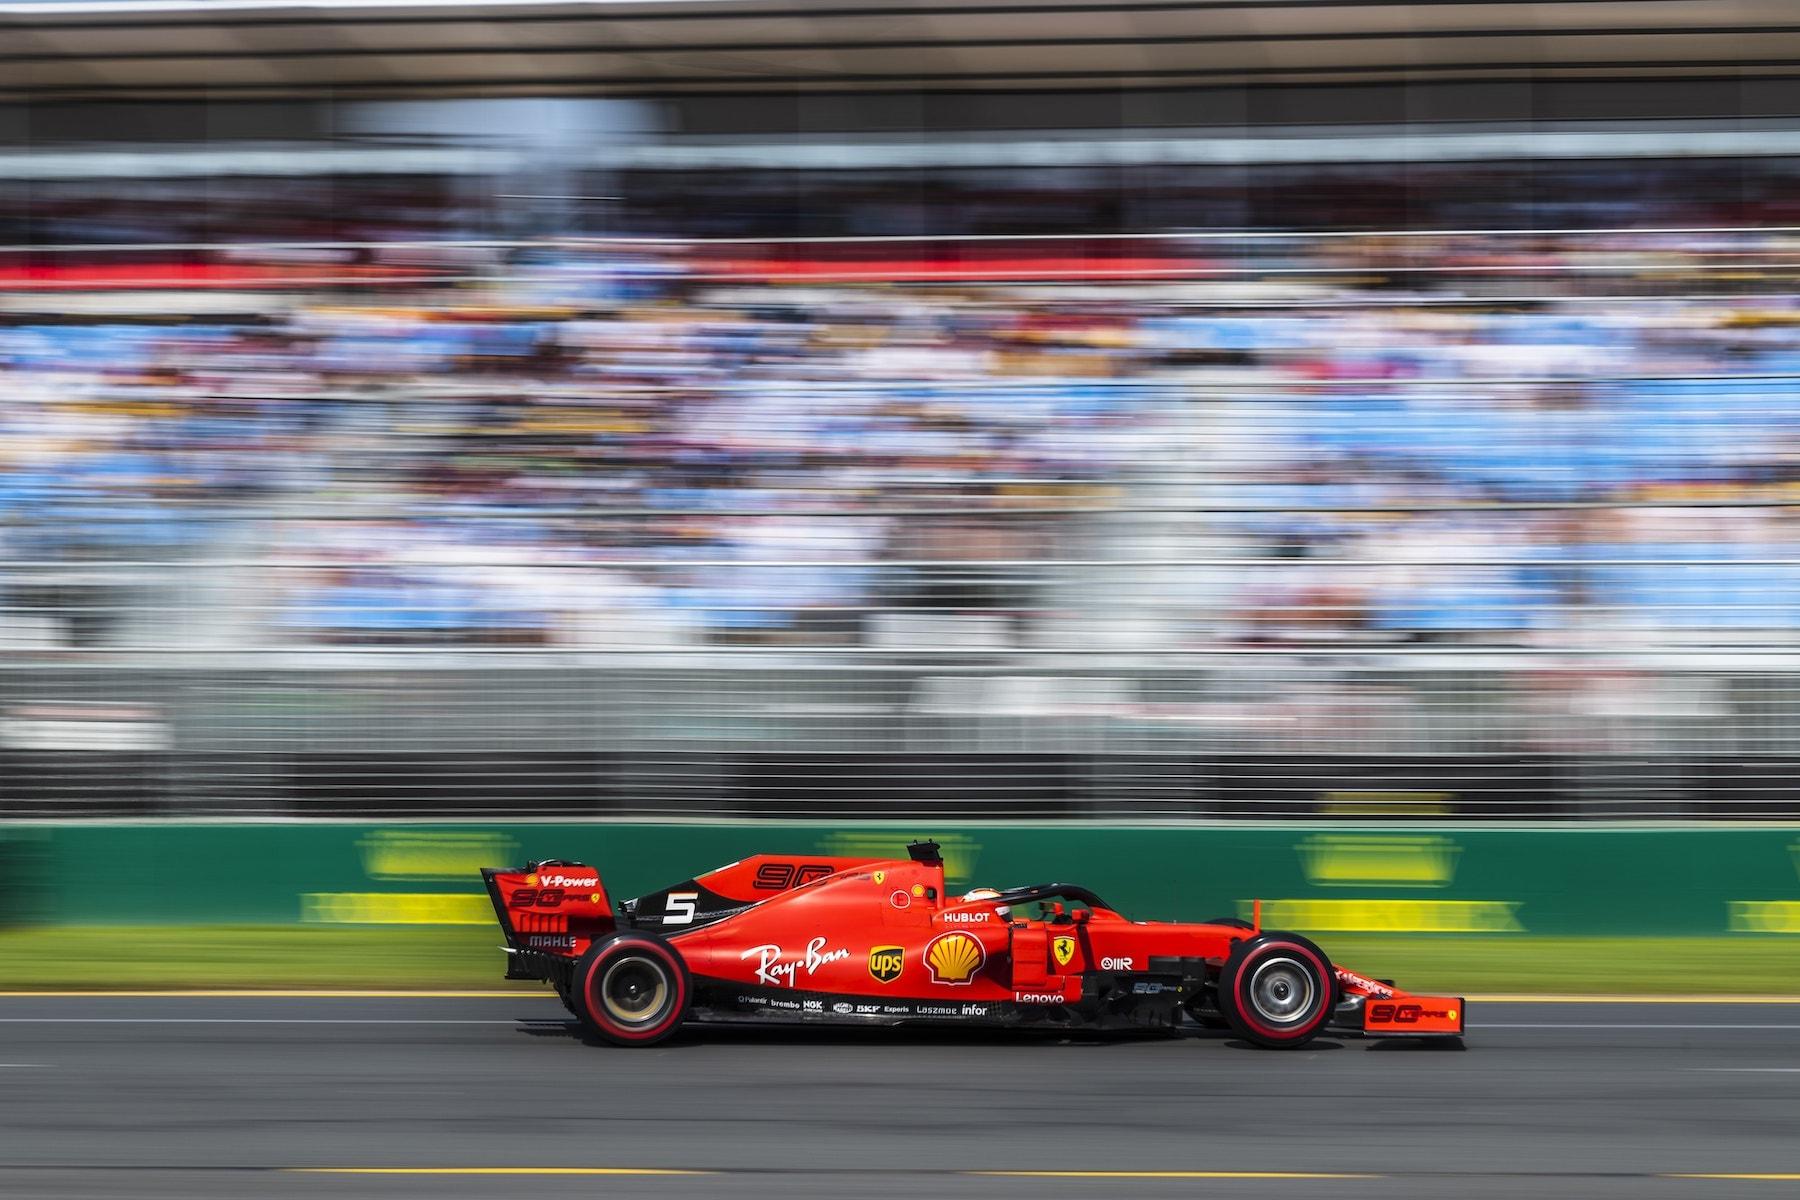 G 2019 Sebastian Vettel | Ferrari SF90 | 2019 Australian GP Q 2 copy.jpg